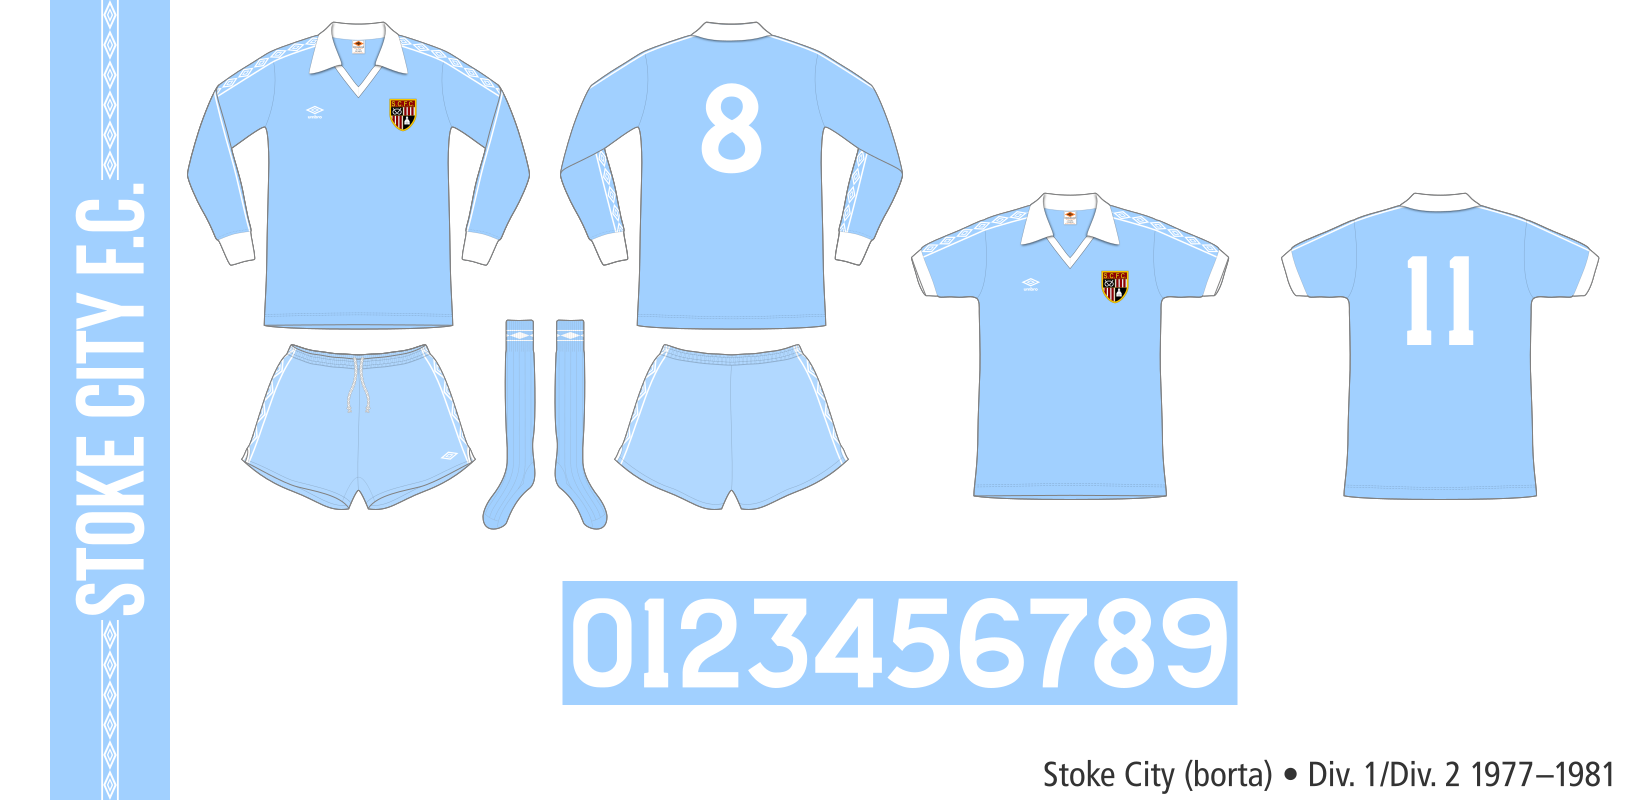 Stoke City 1977–1981 (borta)